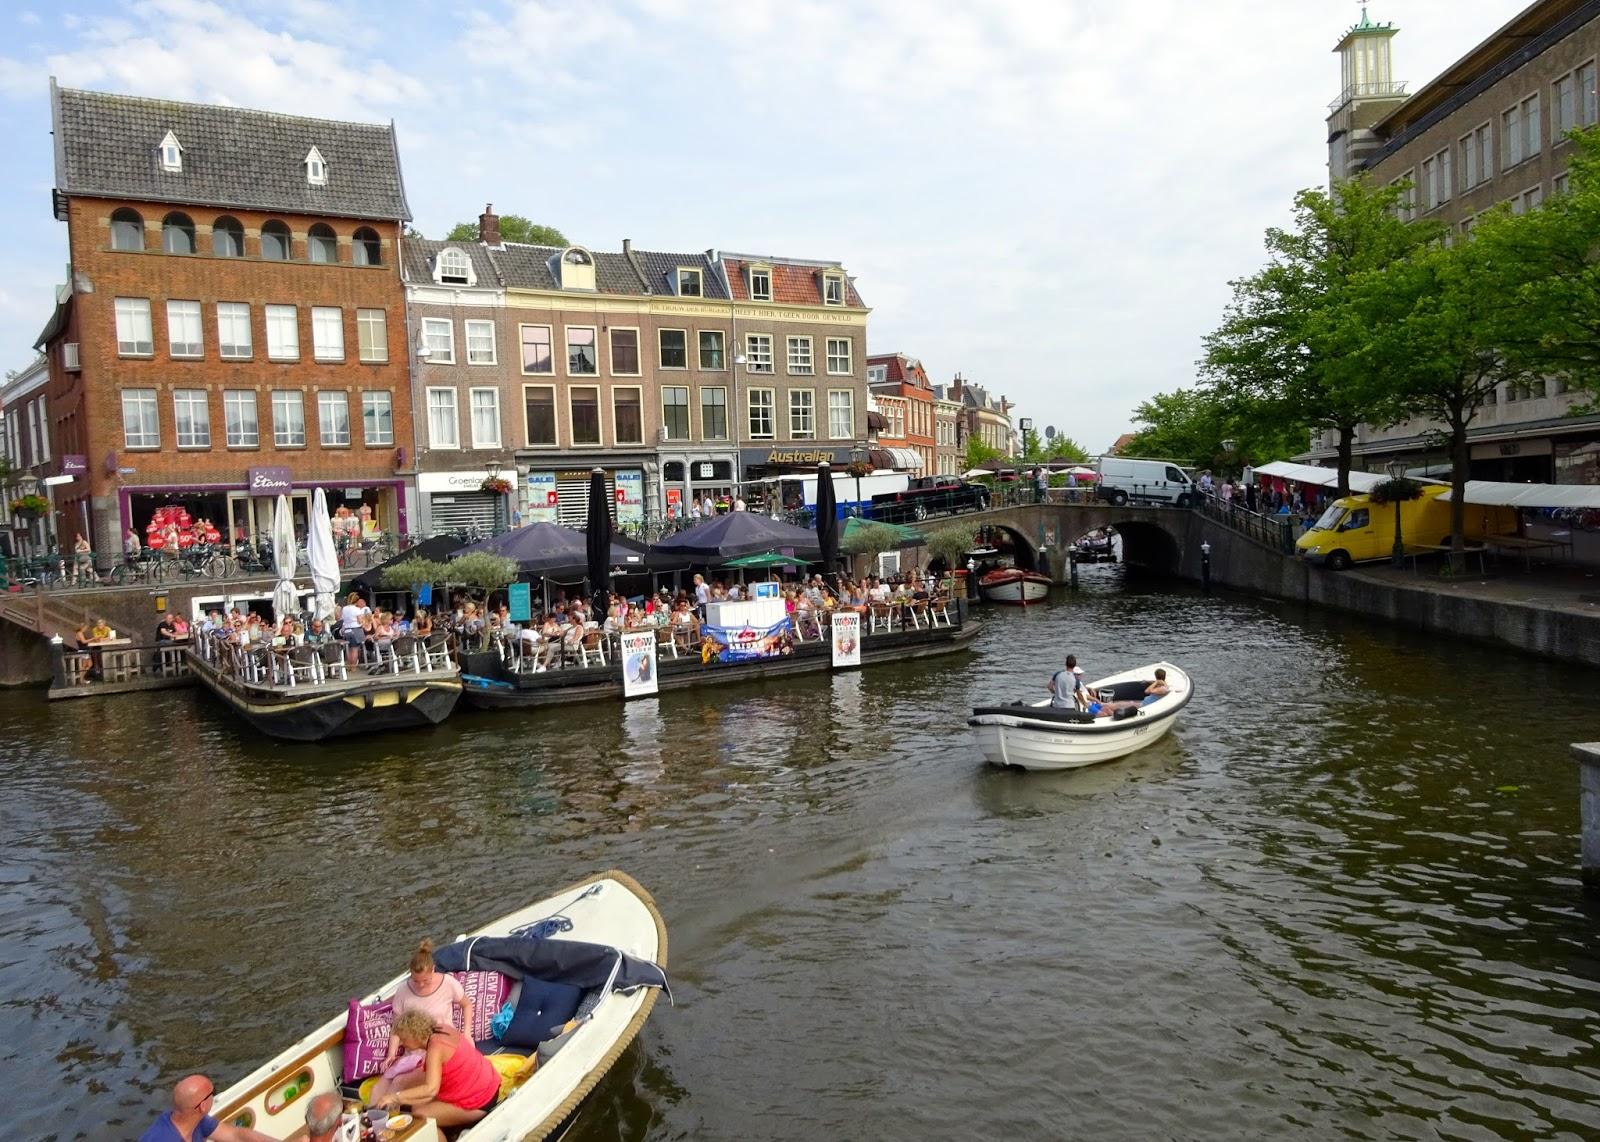 Cyclist Paul's Travels: Leiden, Netherlands